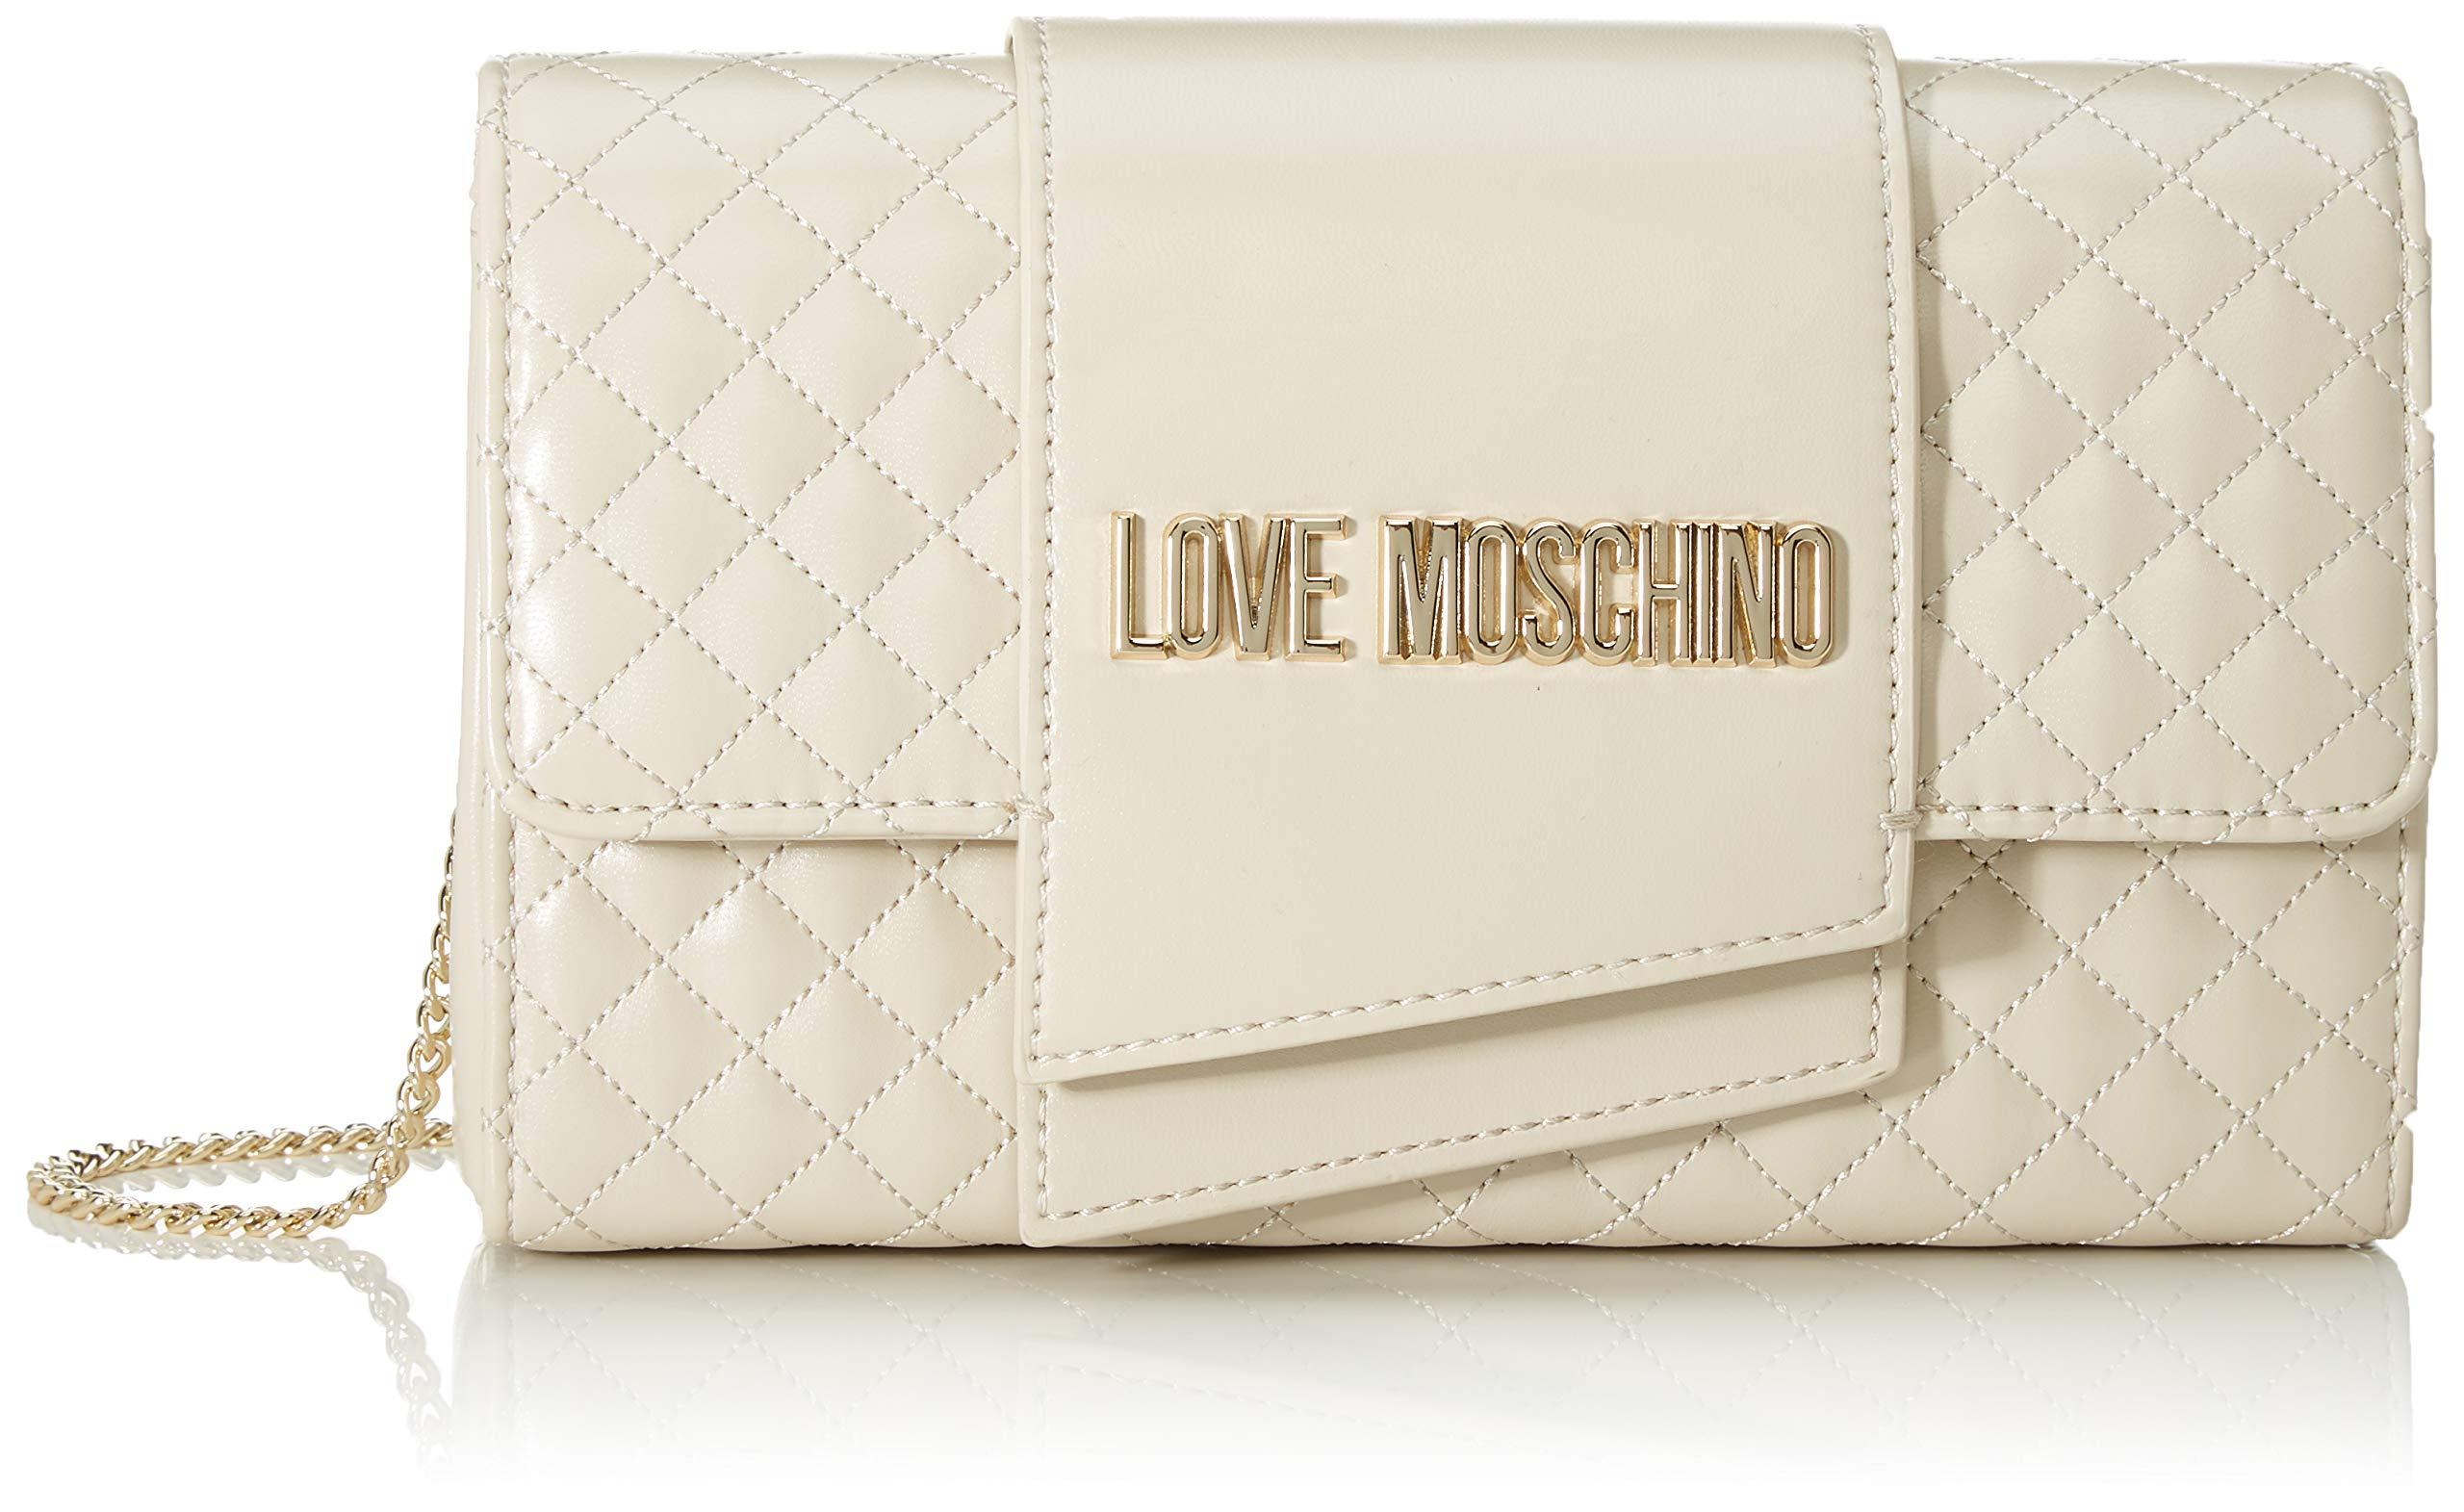 Quilted Moschino L Borsa Love Nappa Cmw X H FemmeEcruavorio13x23x6 PuPochettes 0wONnvm8